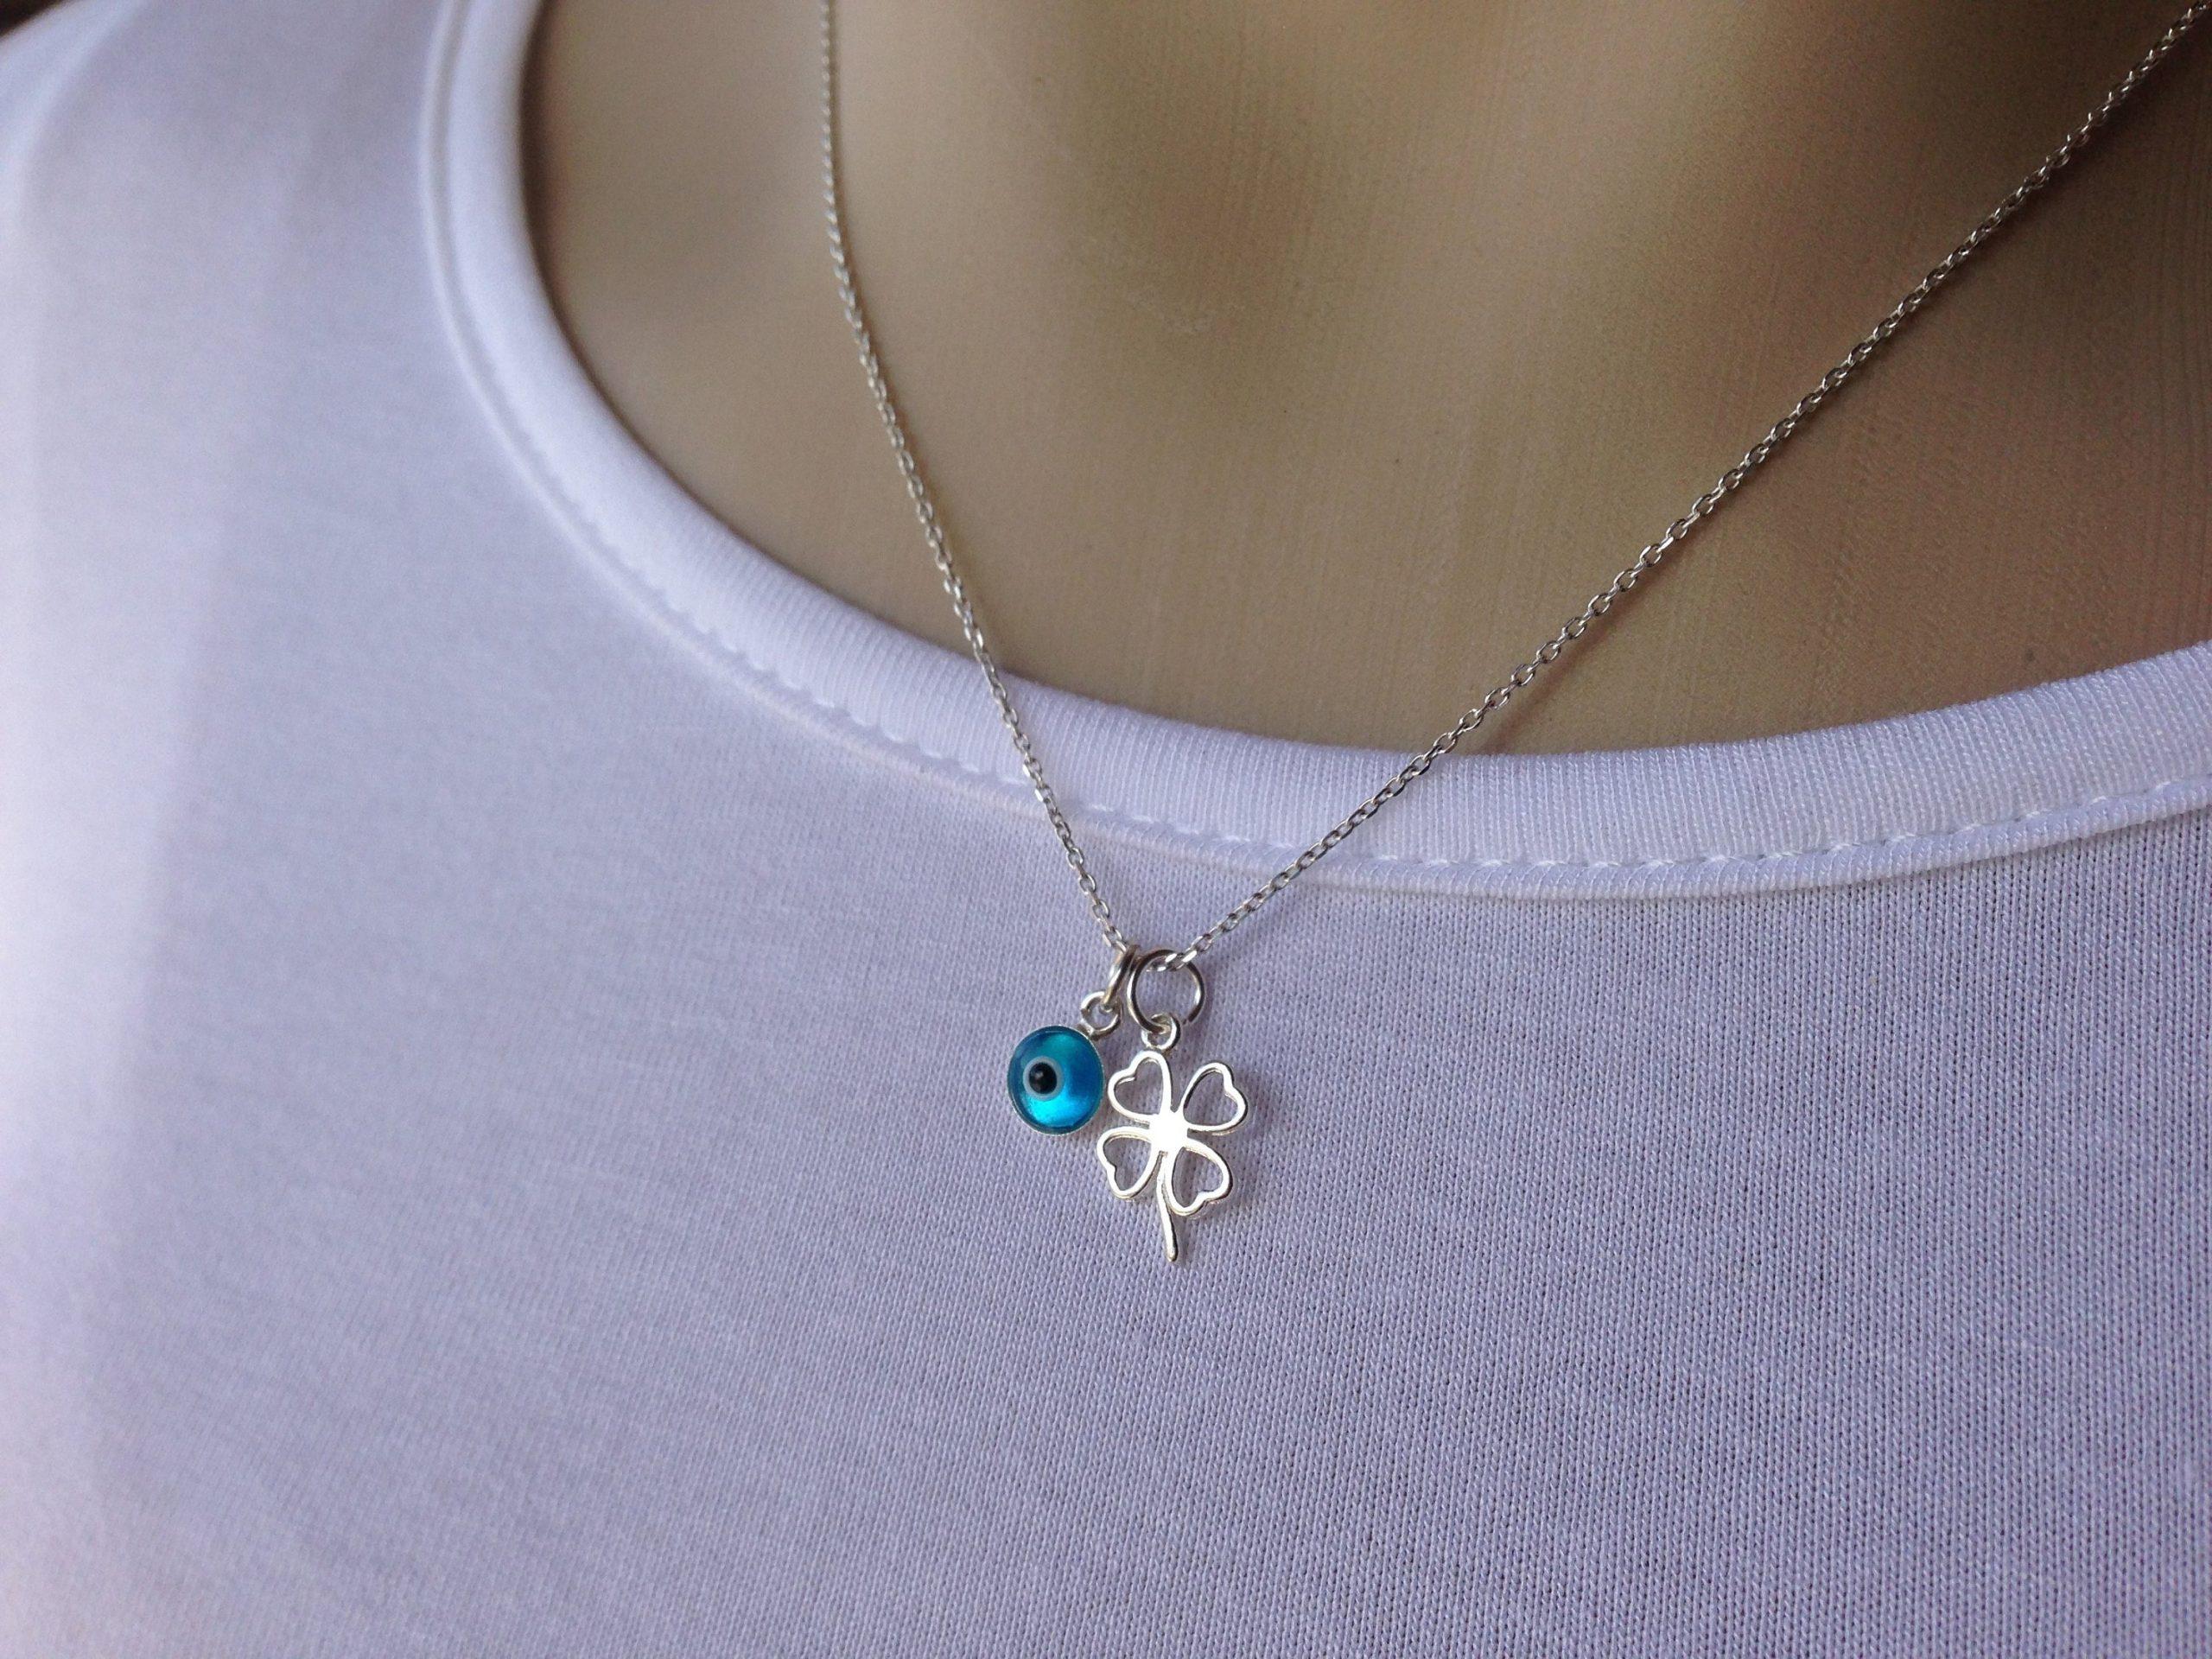 clover evil eye necklace